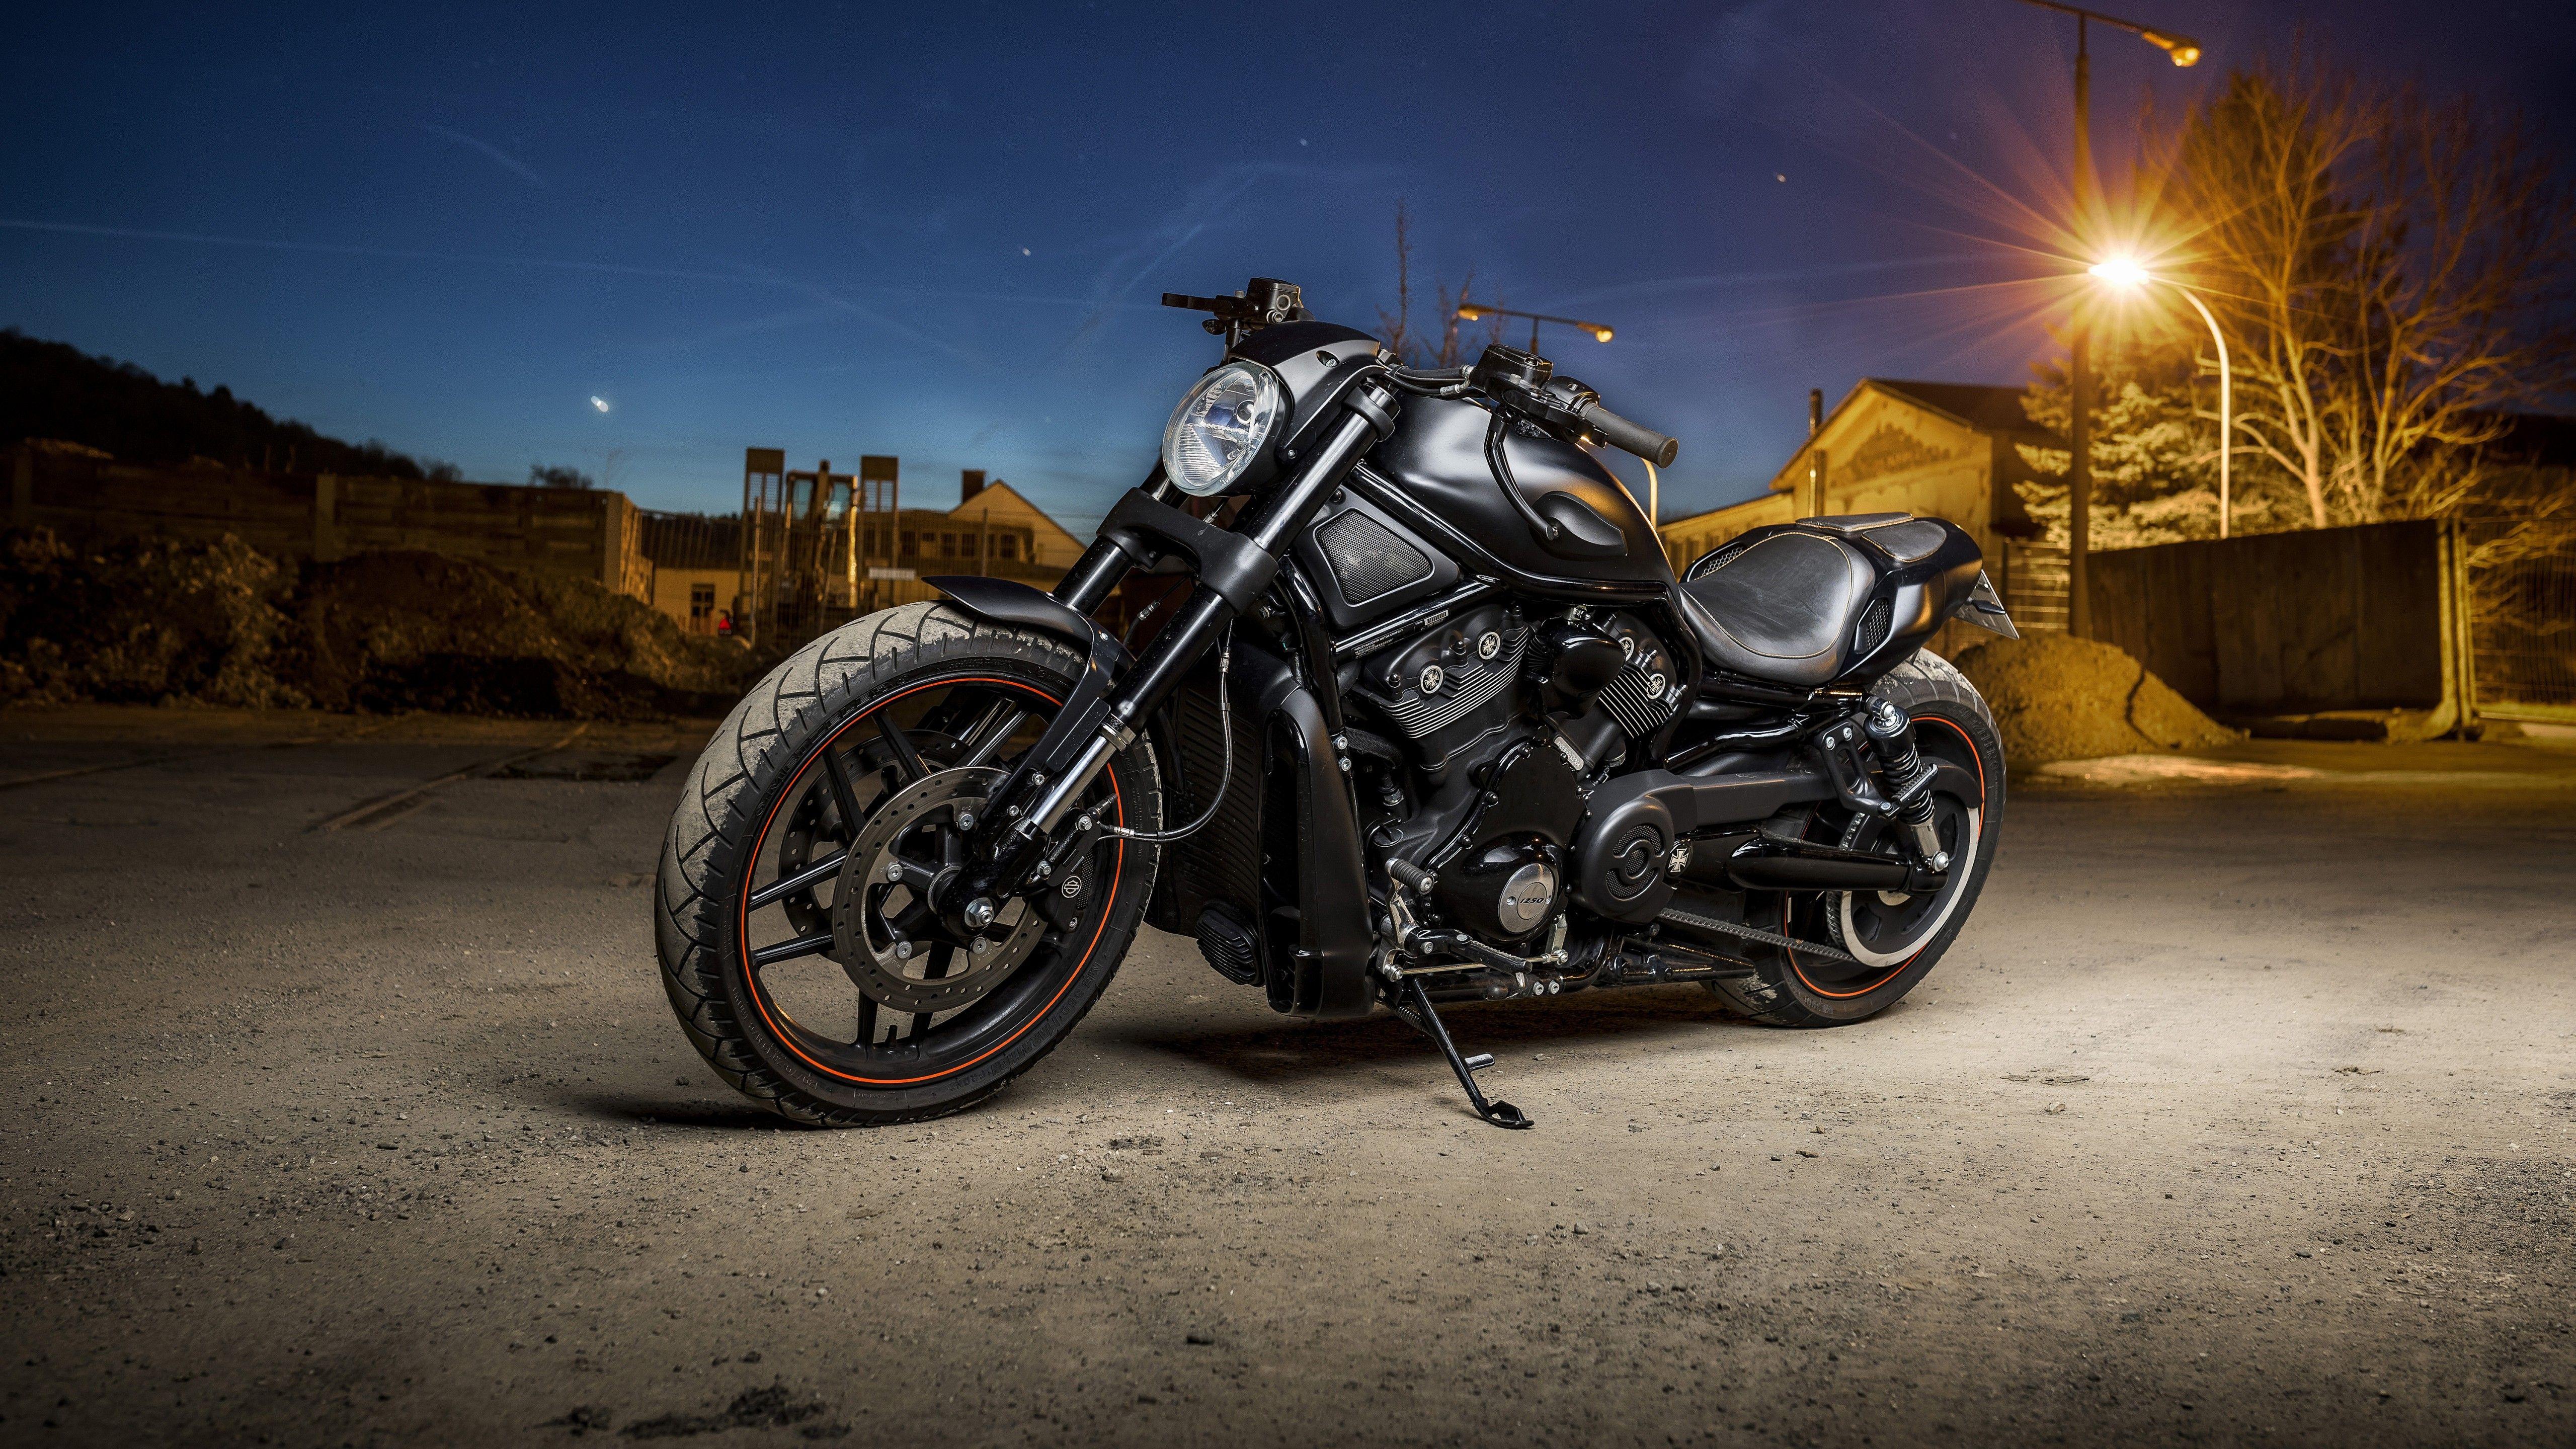 Super bike Harley davidson, Motorcycle wallpaper